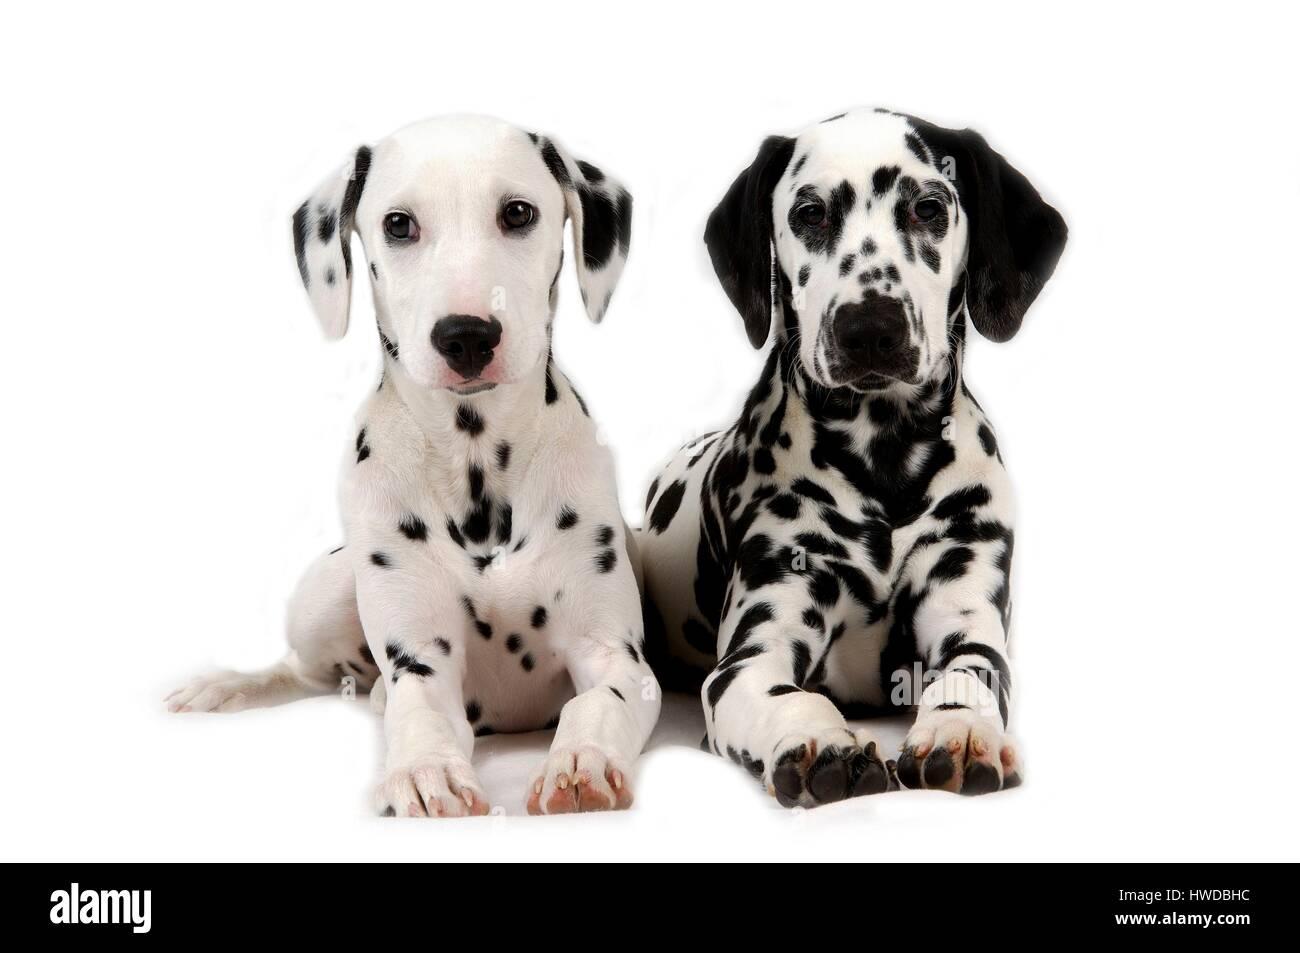 Dalmatian dog (Canis lupus familiaris) - Stock Image